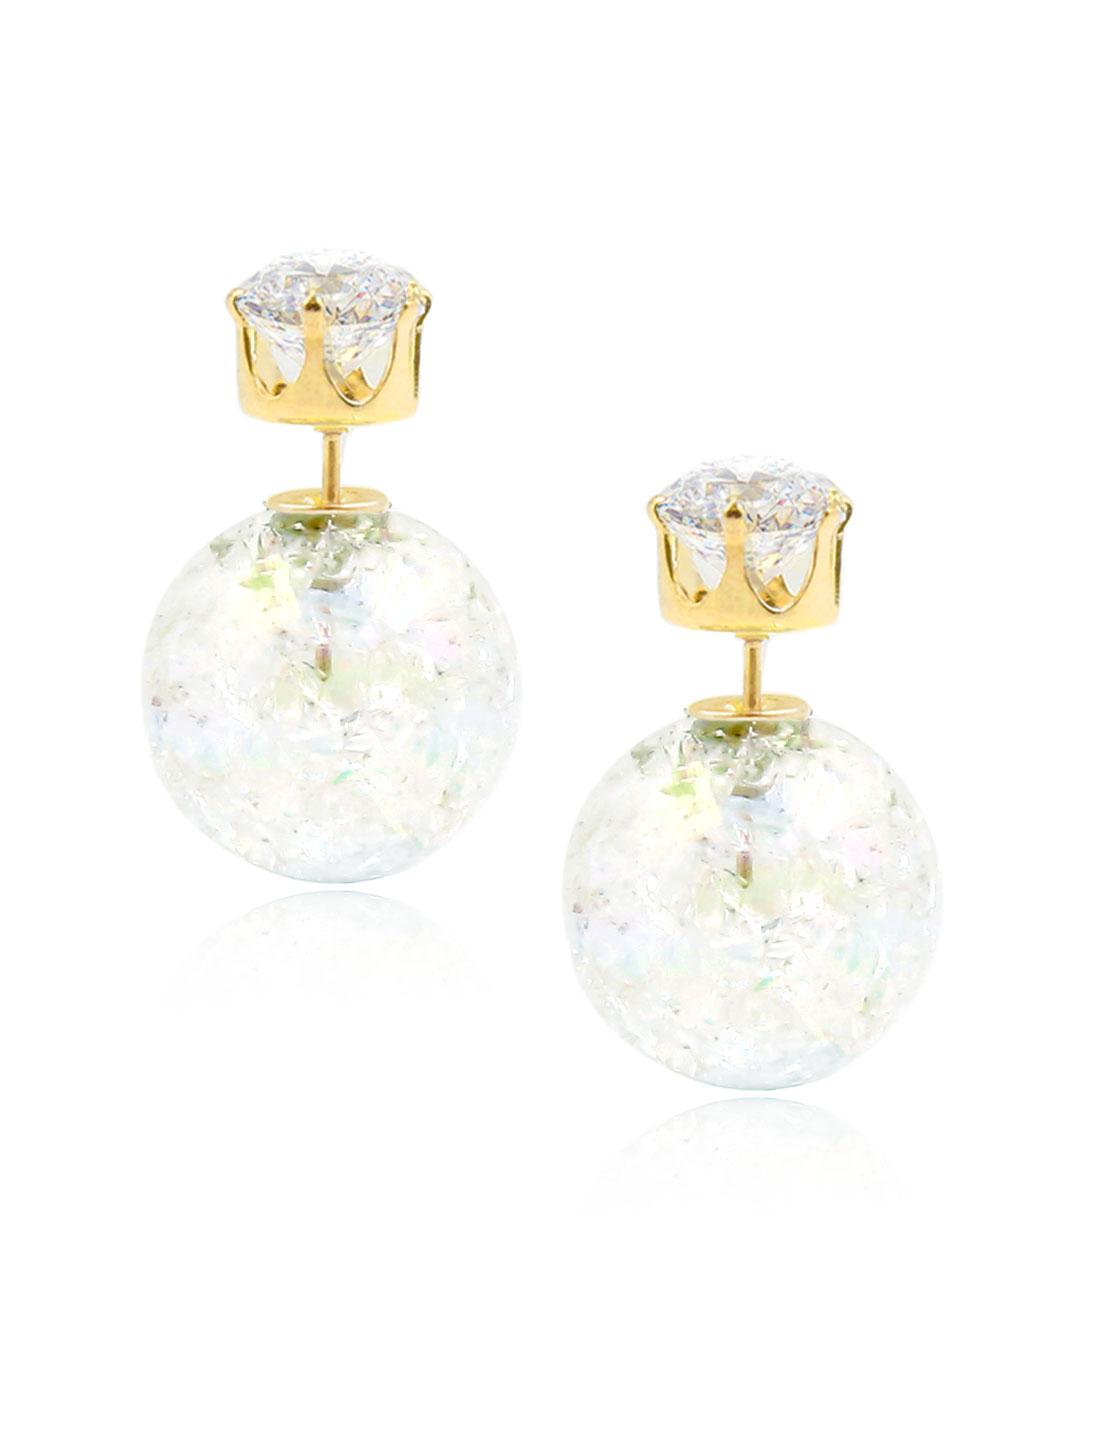 Fashion Women Elegant Double Sides Zircon Faux Crystal Ball Illusion-colour Earrings Ear Stud 1 Pair White